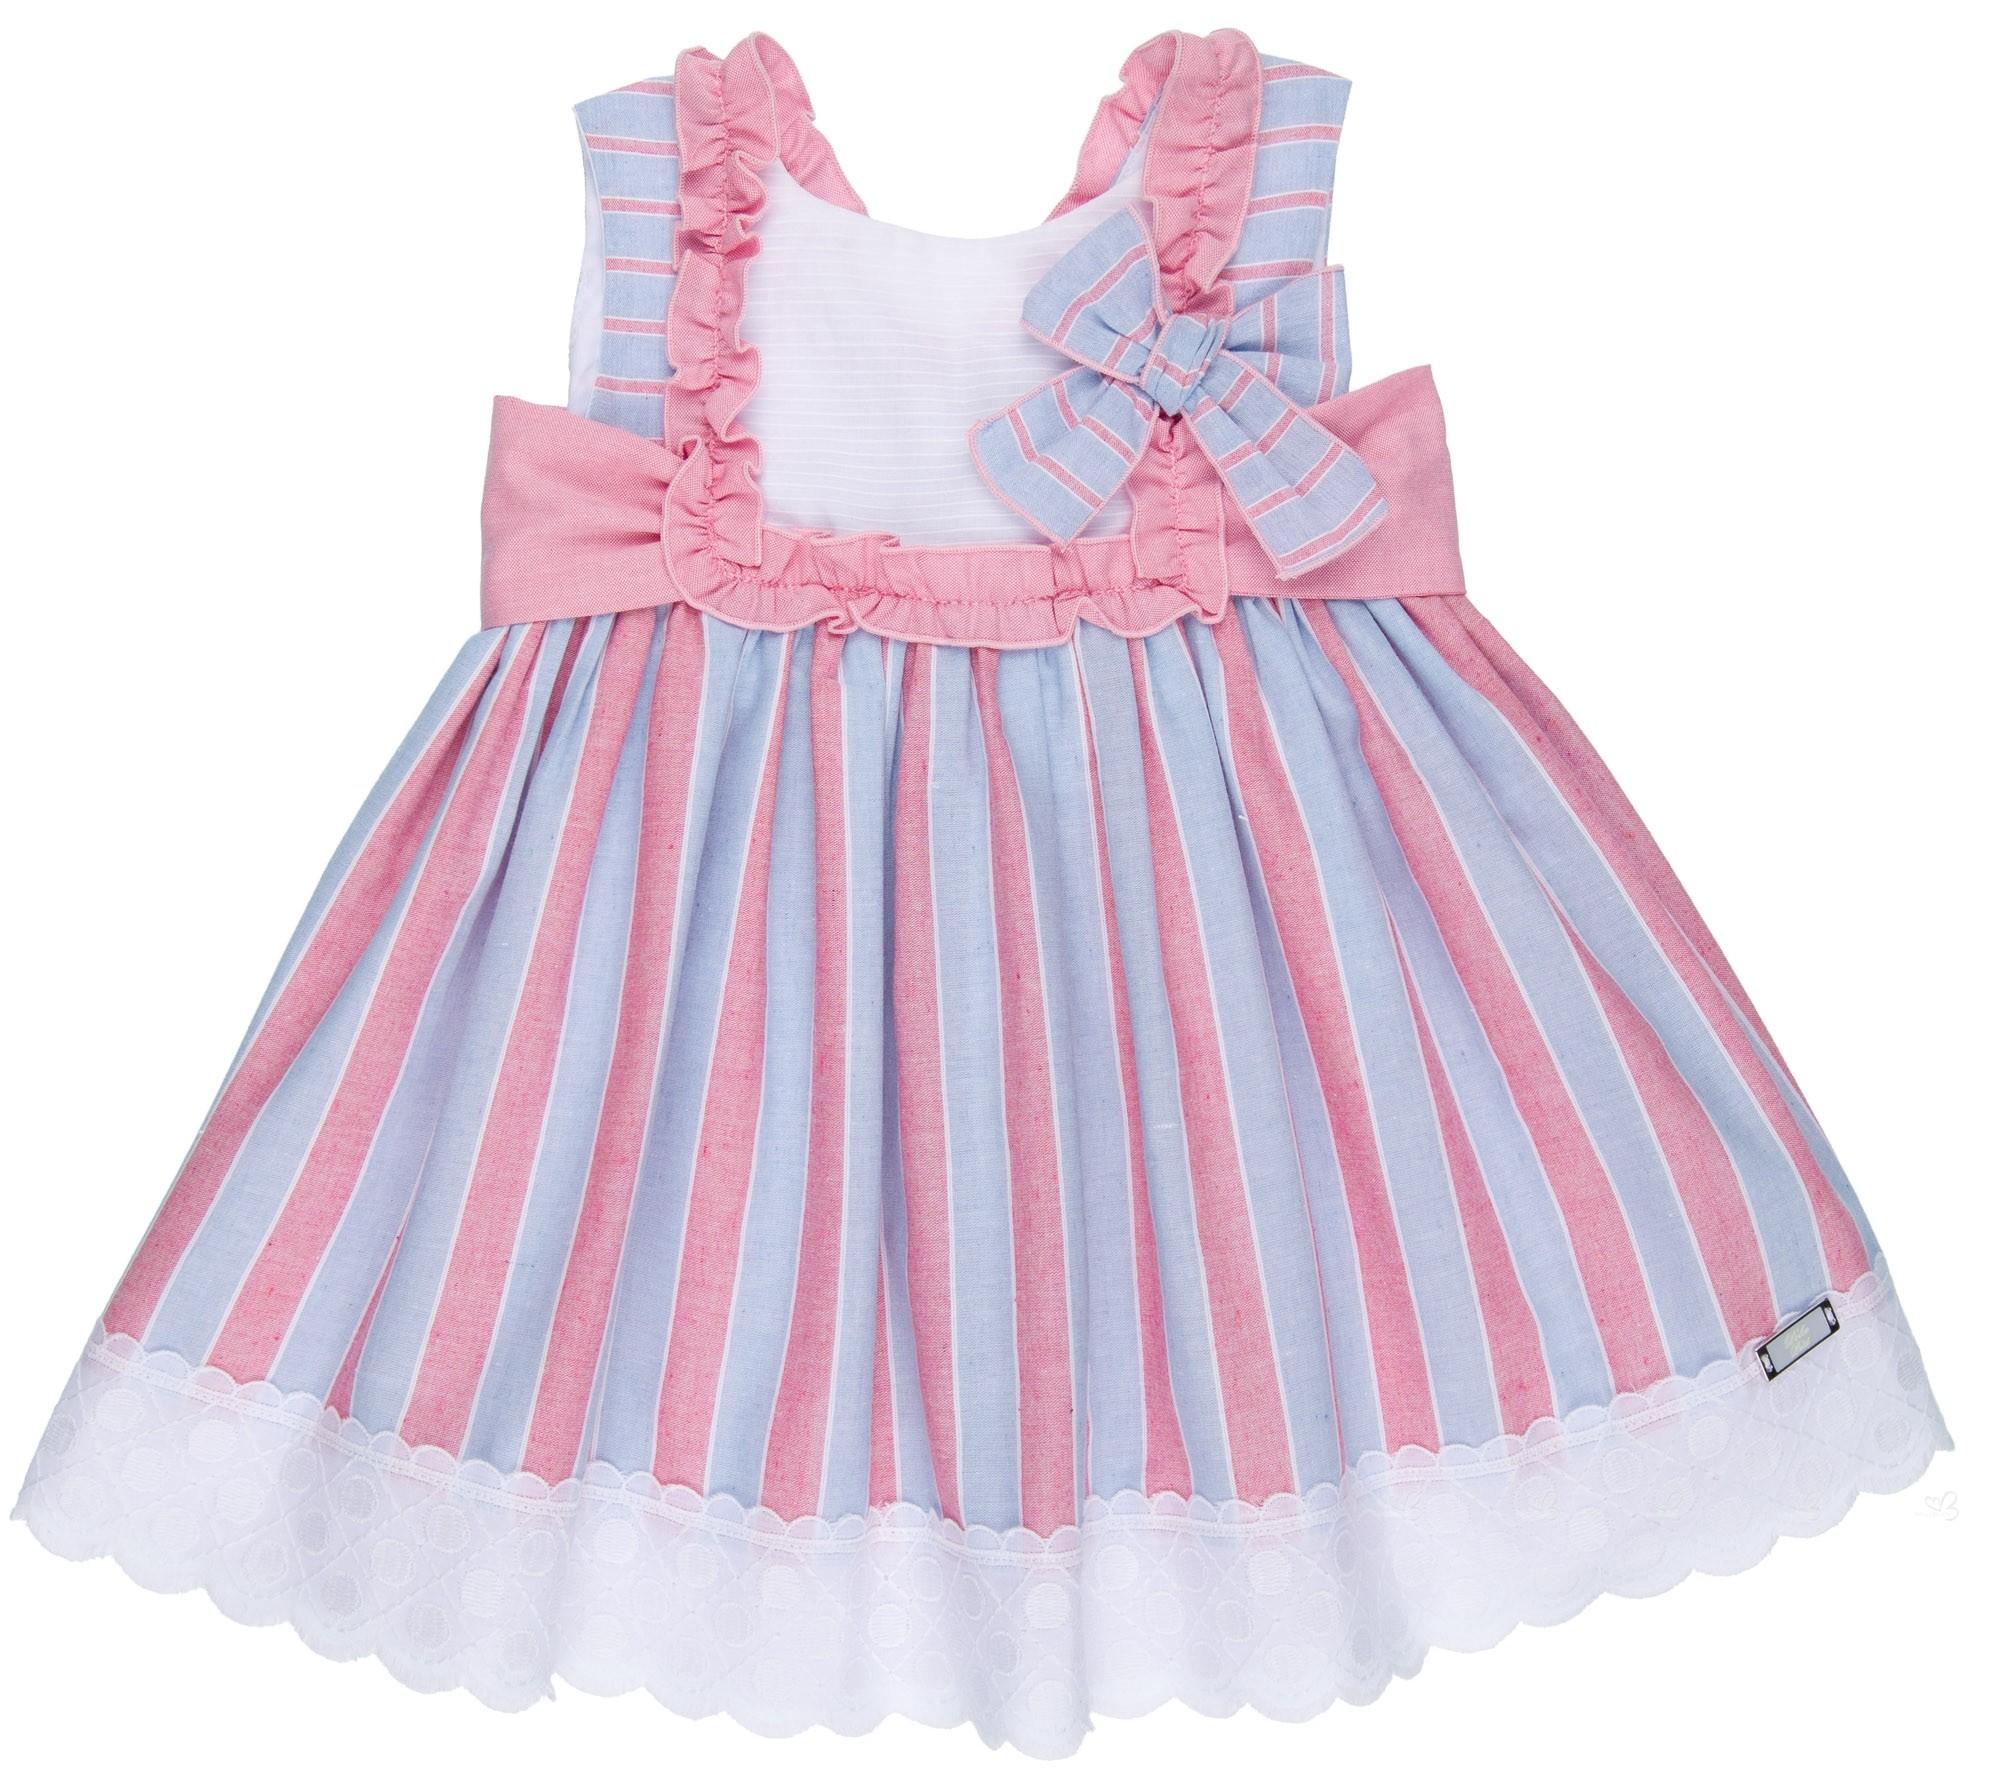 cd675657a Home; Girls Blue & Pale Pink Cotton Striped Dress. Vestido Niña Canesú  Algodón Rayitas Azul & Rosa ...